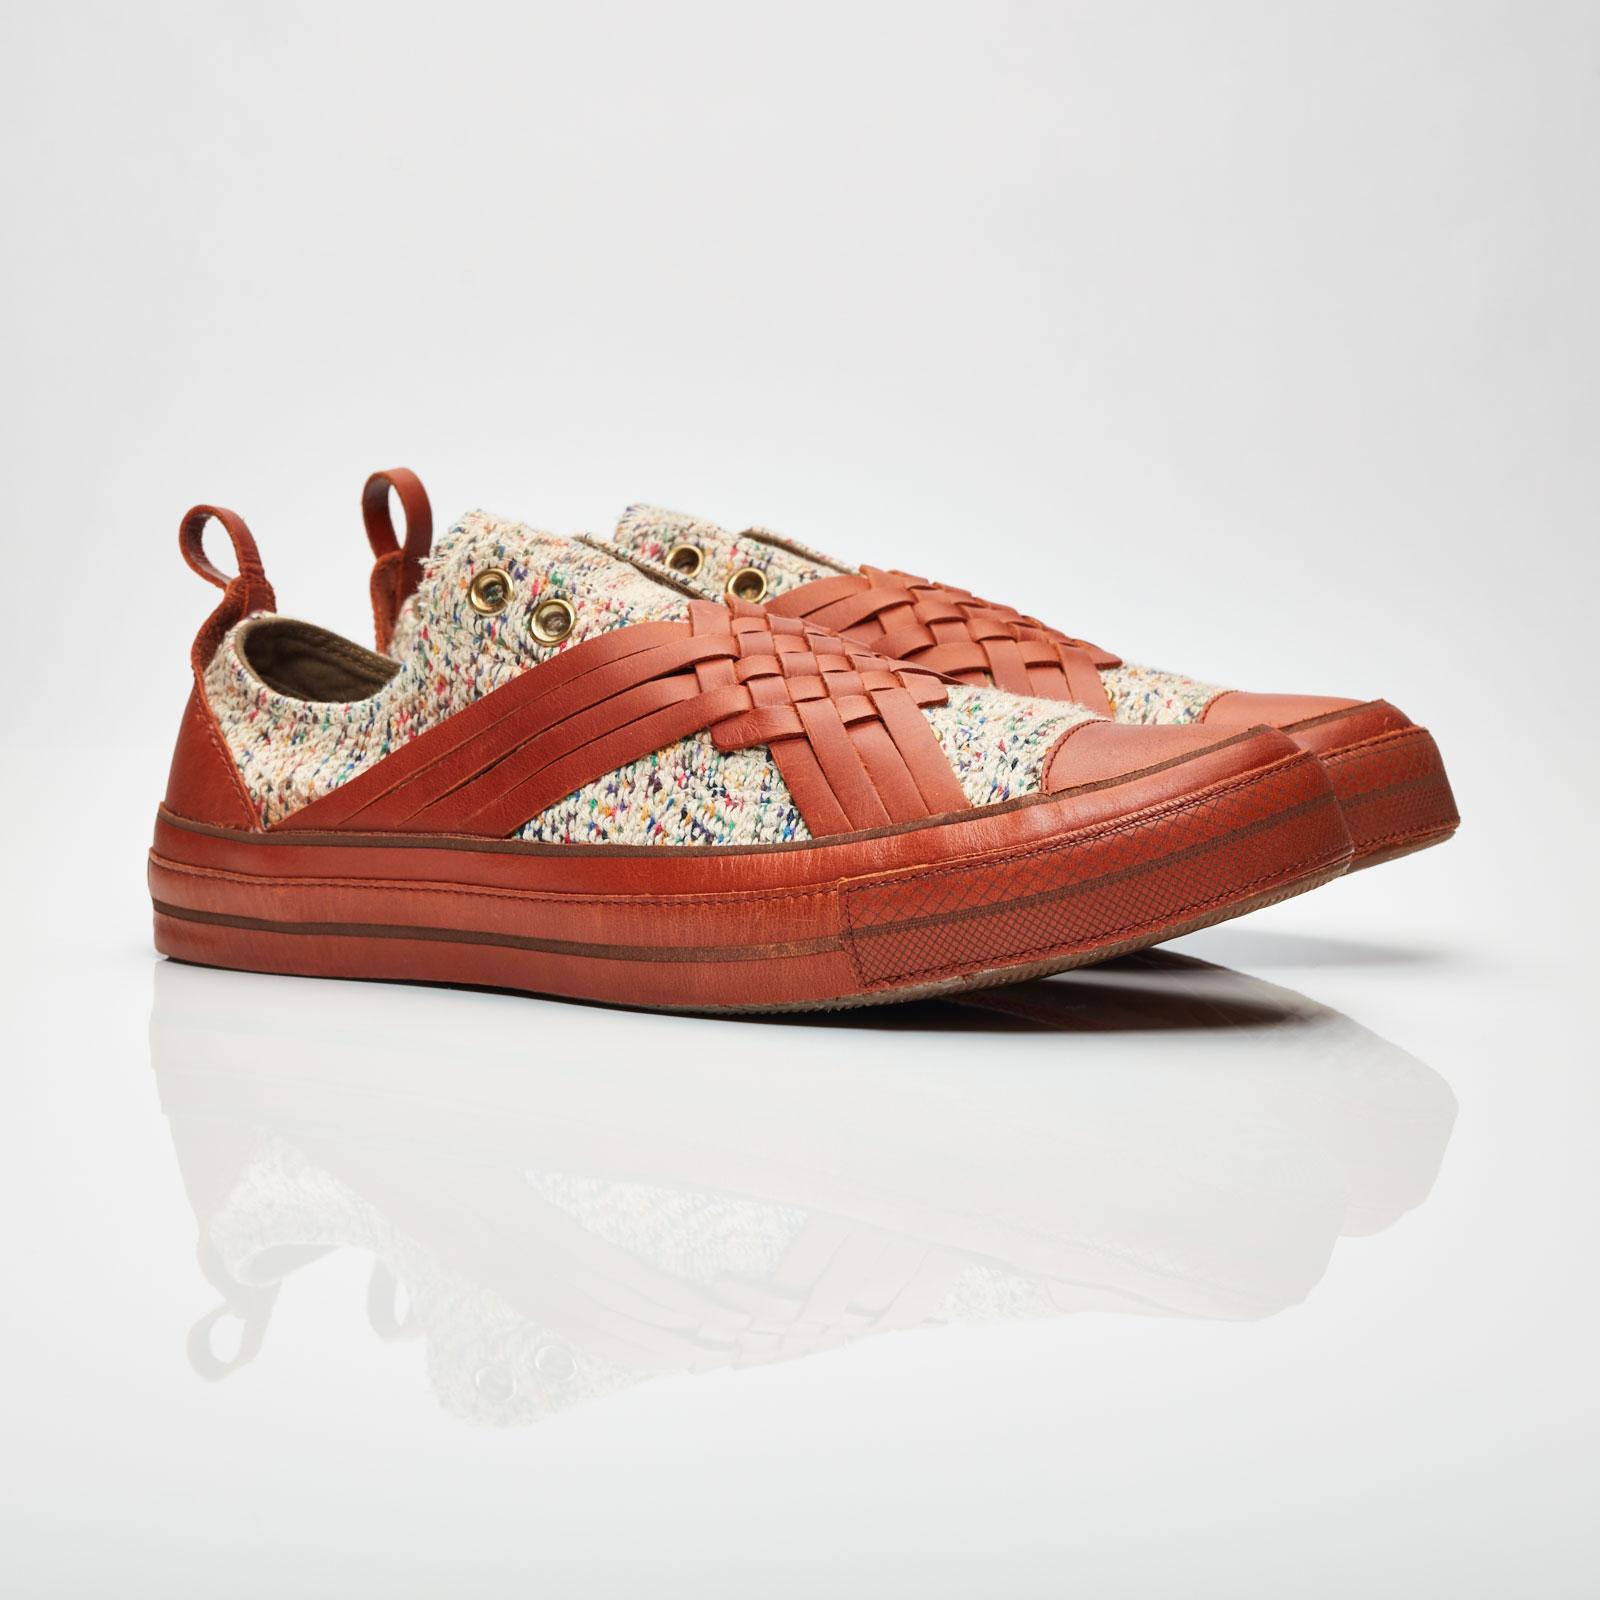 ba4cc2f69de8 Converse Chuck 70s Slip x Missoni - 157258c - Sneakersnstuff ...